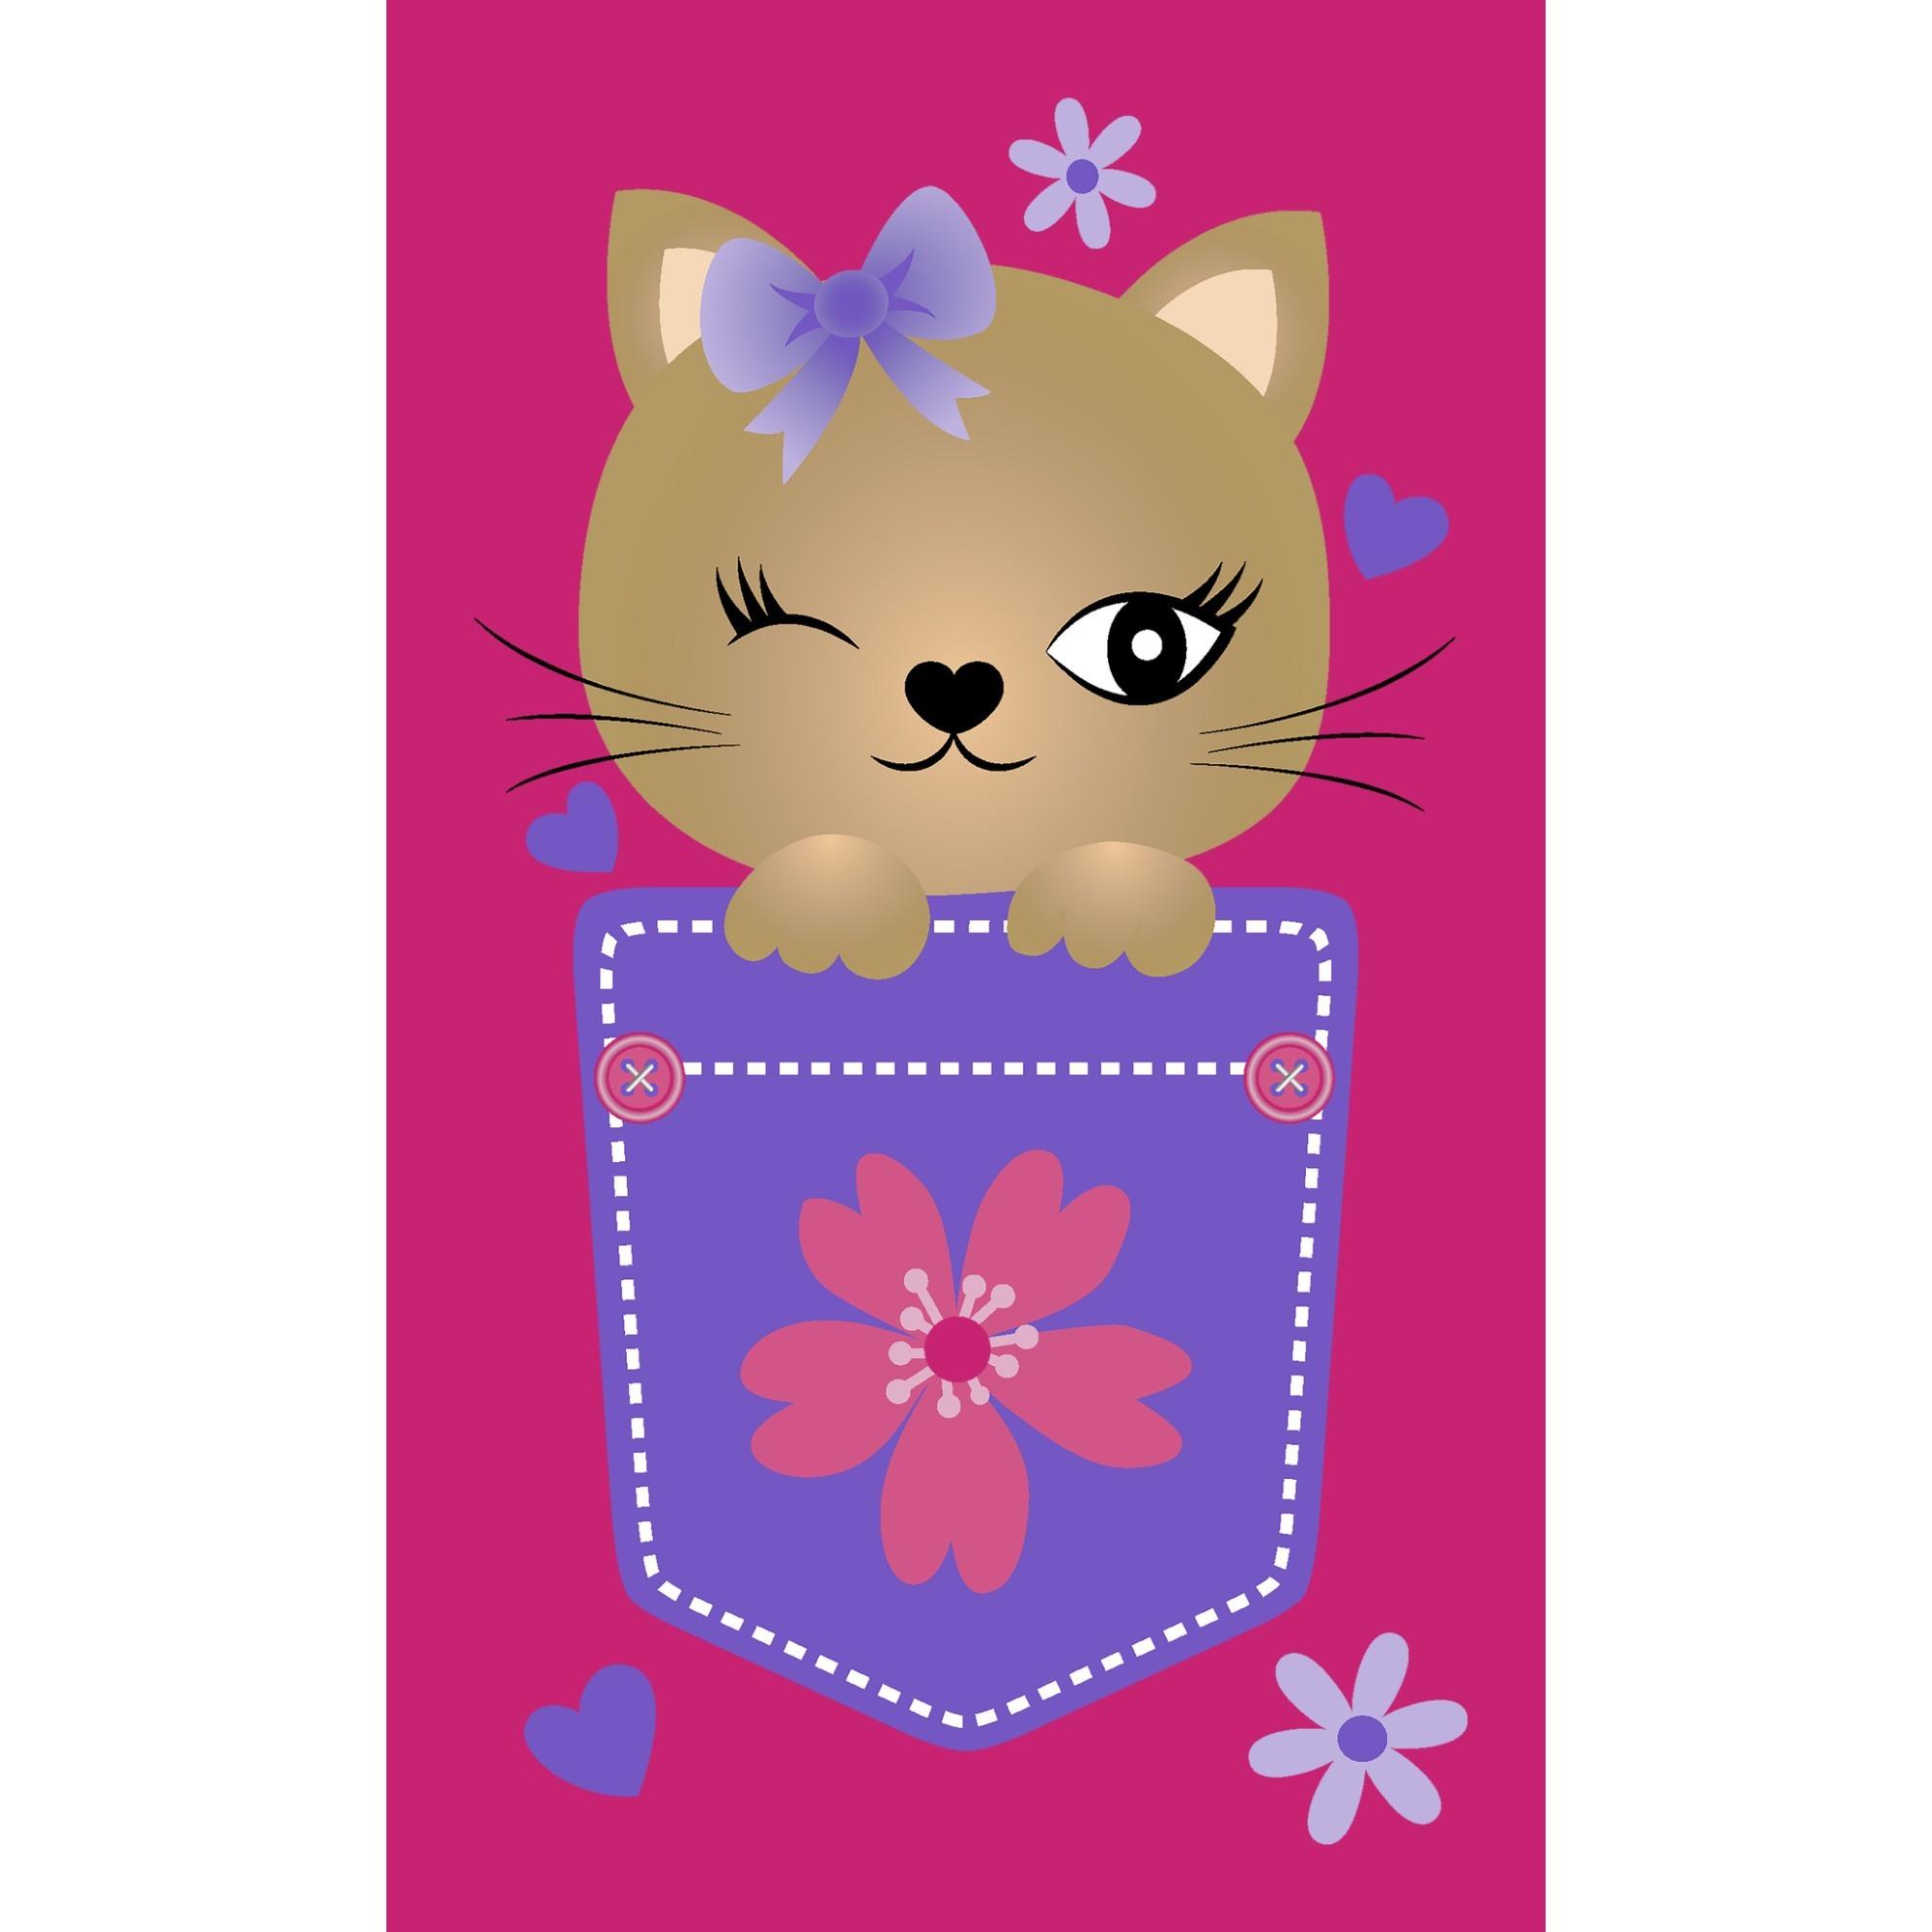 Toalha de Visita Aveludada Mao Ou Lavabo Infantil 100 Algodao 30x50 cm Rosa Pink- Buettner